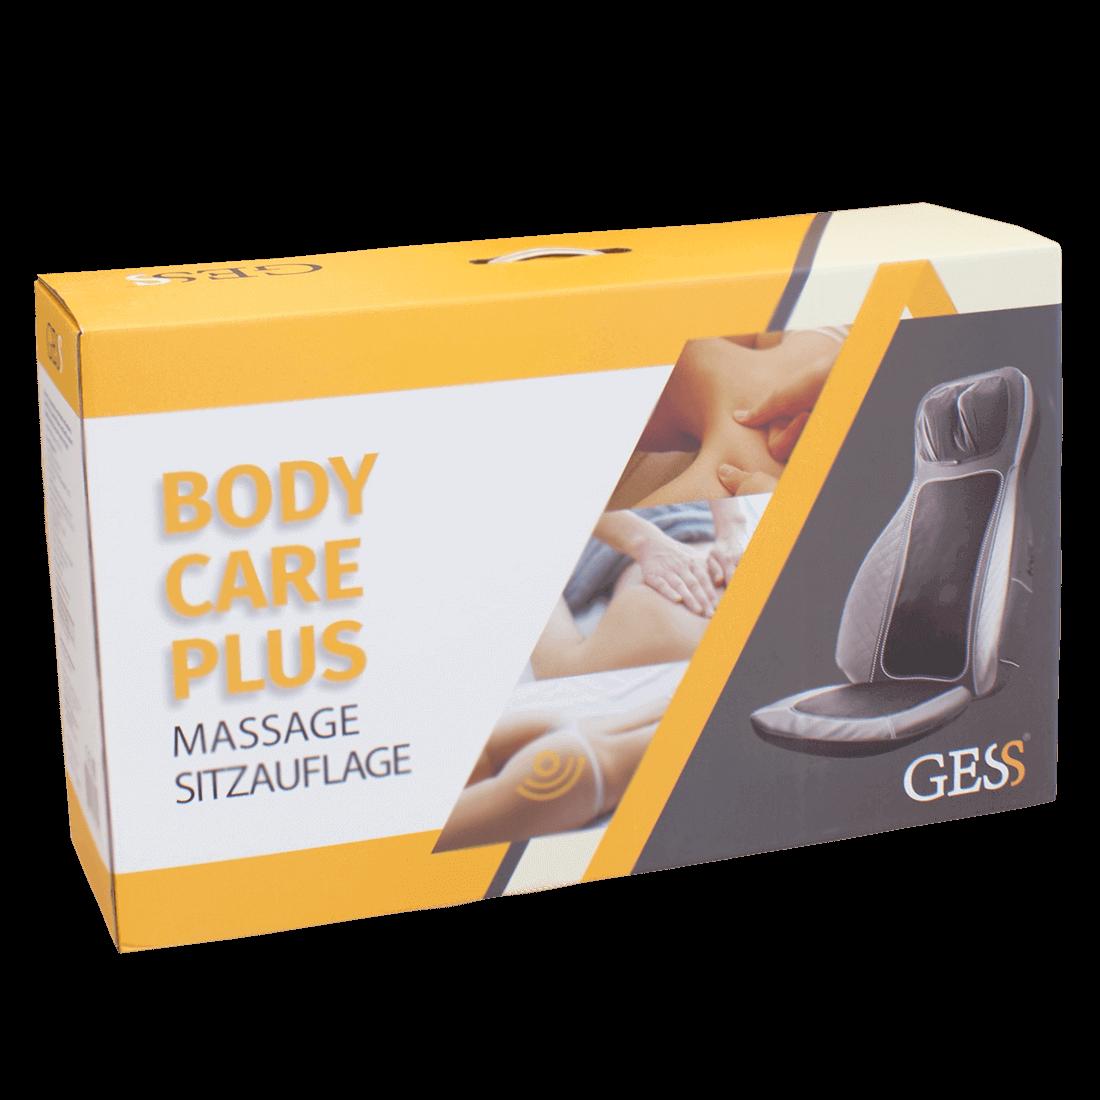 Massage Seat BodyCare Next